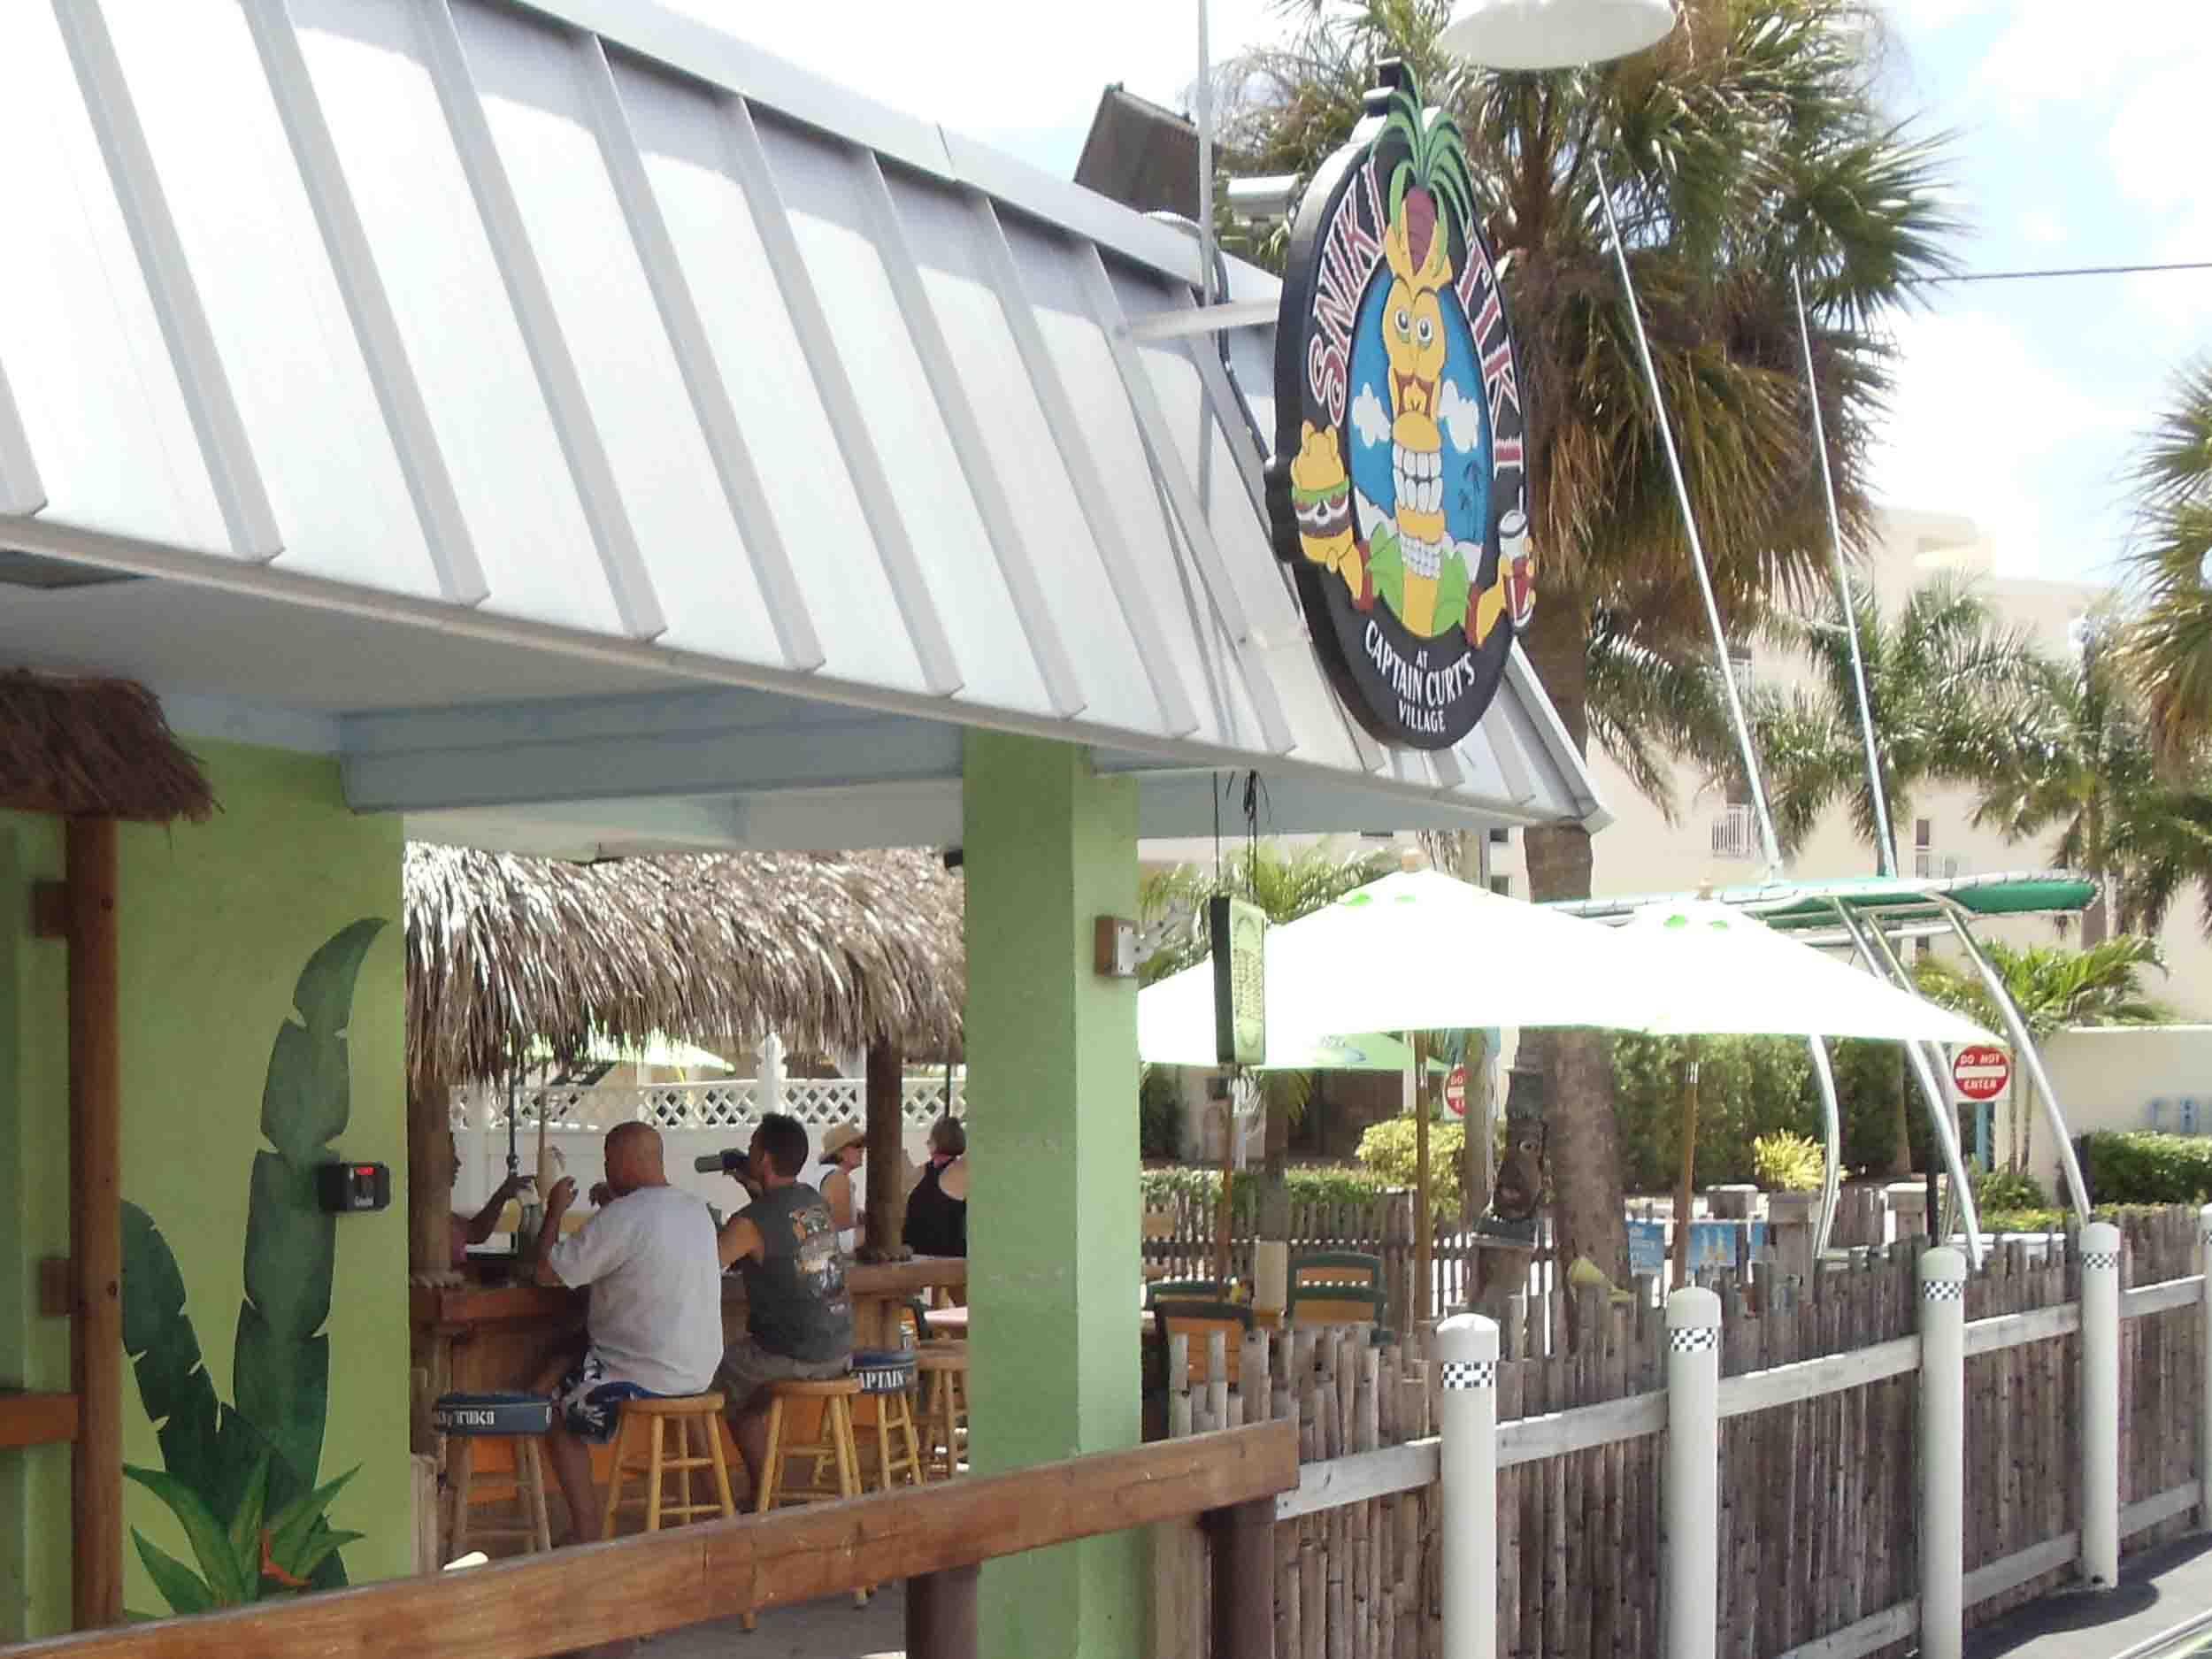 Captain Curt's Sniki Tiki Bar